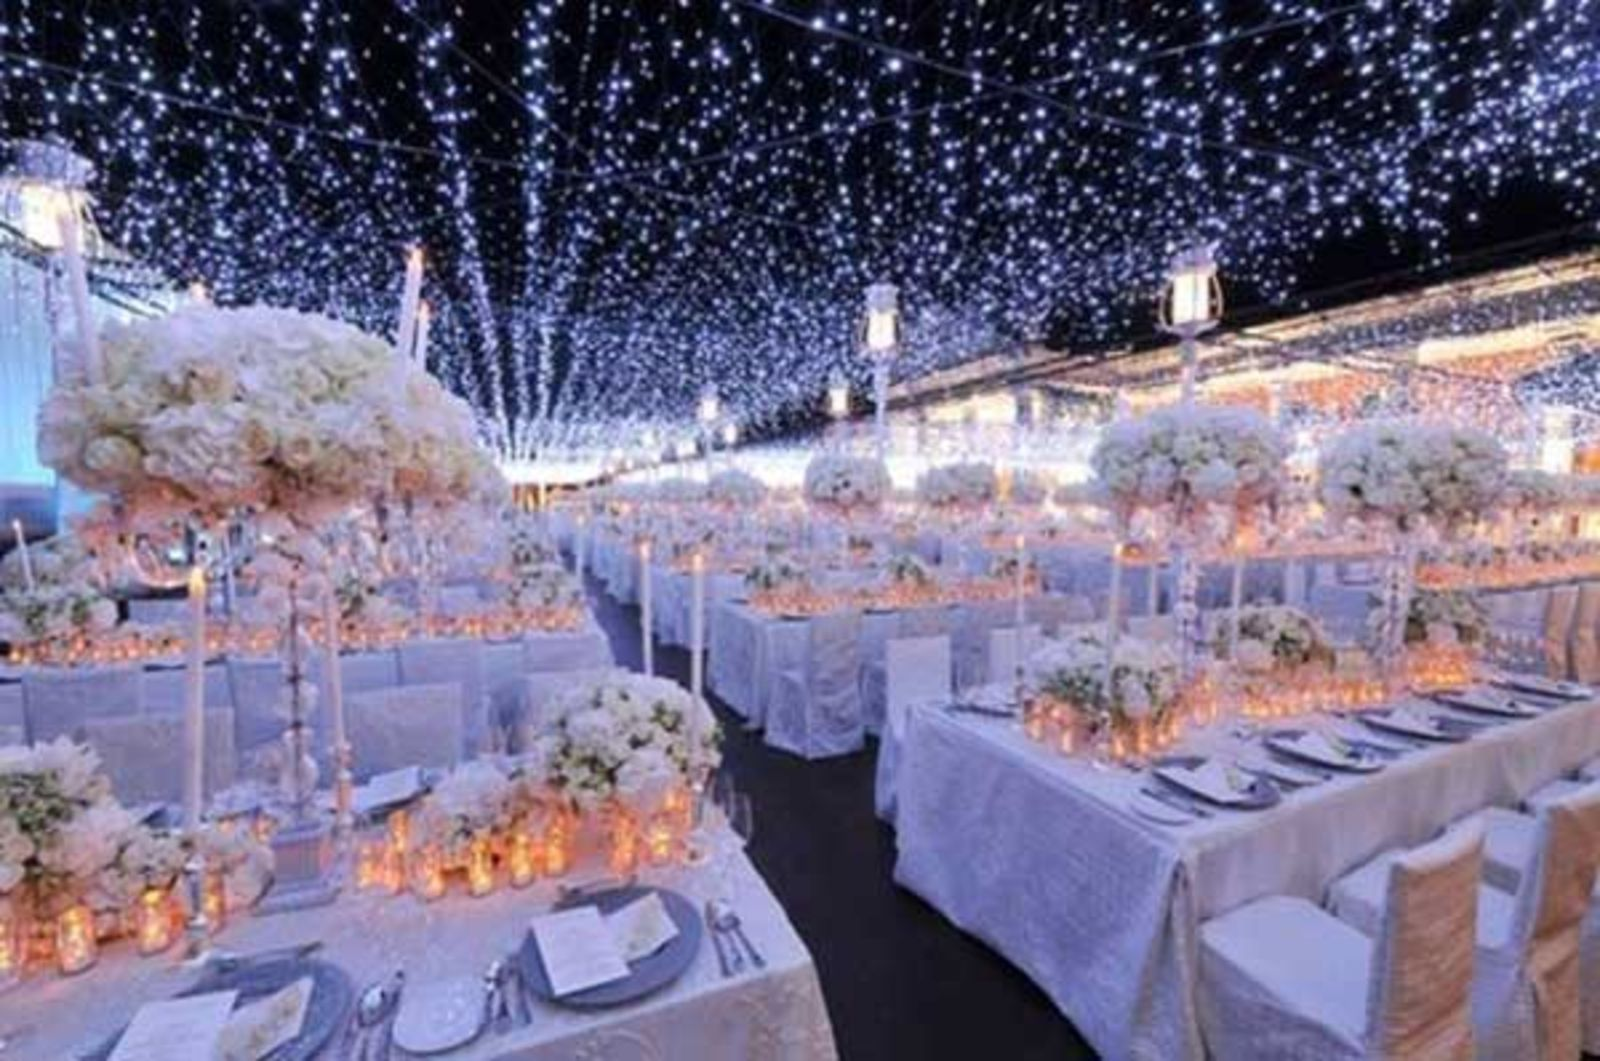 Unique Wedding Reception Ideas 114 1600x1061 Jpg 1600 1061 Starry Night Wedding Theme Starry Night Wedding Winter Wonderland Wedding Decorations